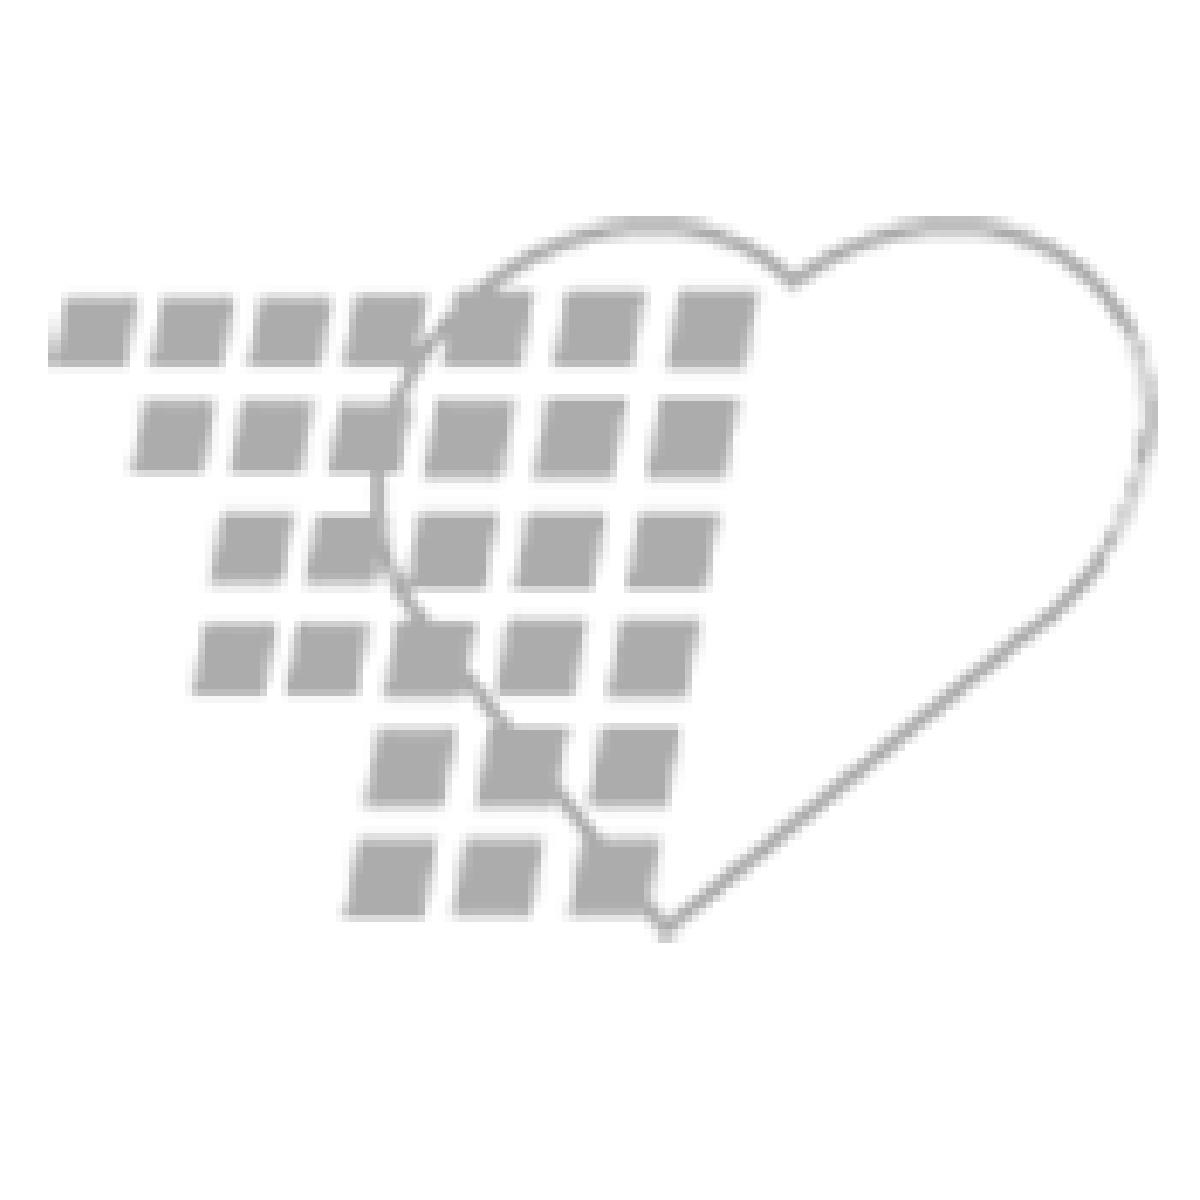 11-81-0095 Nasco Life/form® Injection Training Models